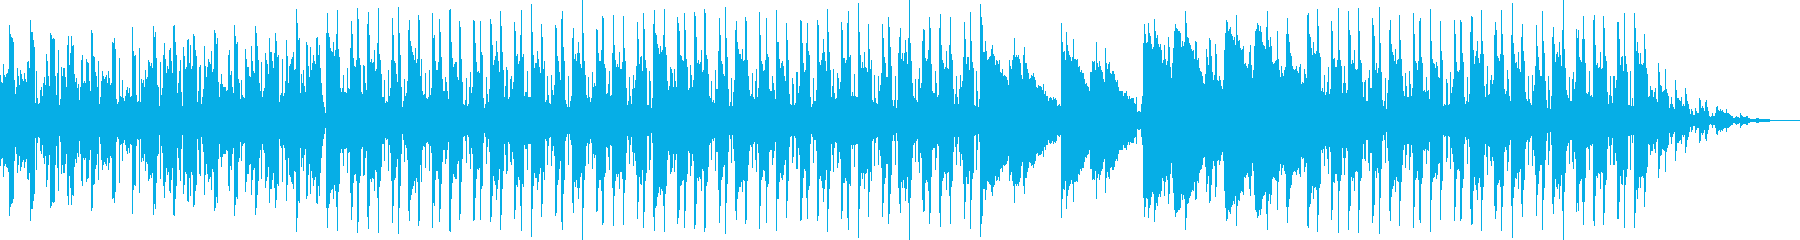 lo-fi hip-hop11の再生済みの波形